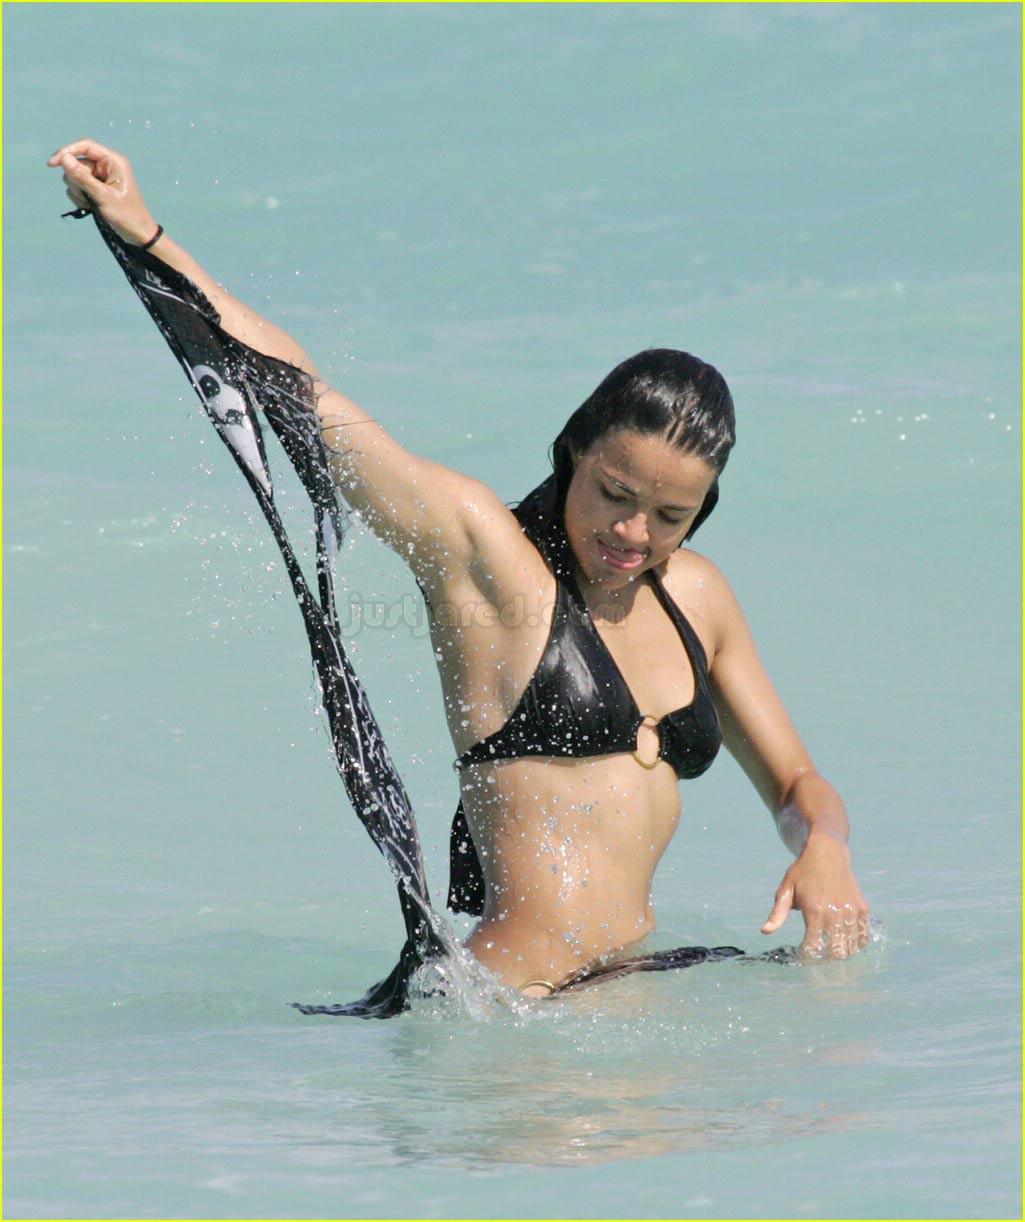 bikinis falling off - photo #24